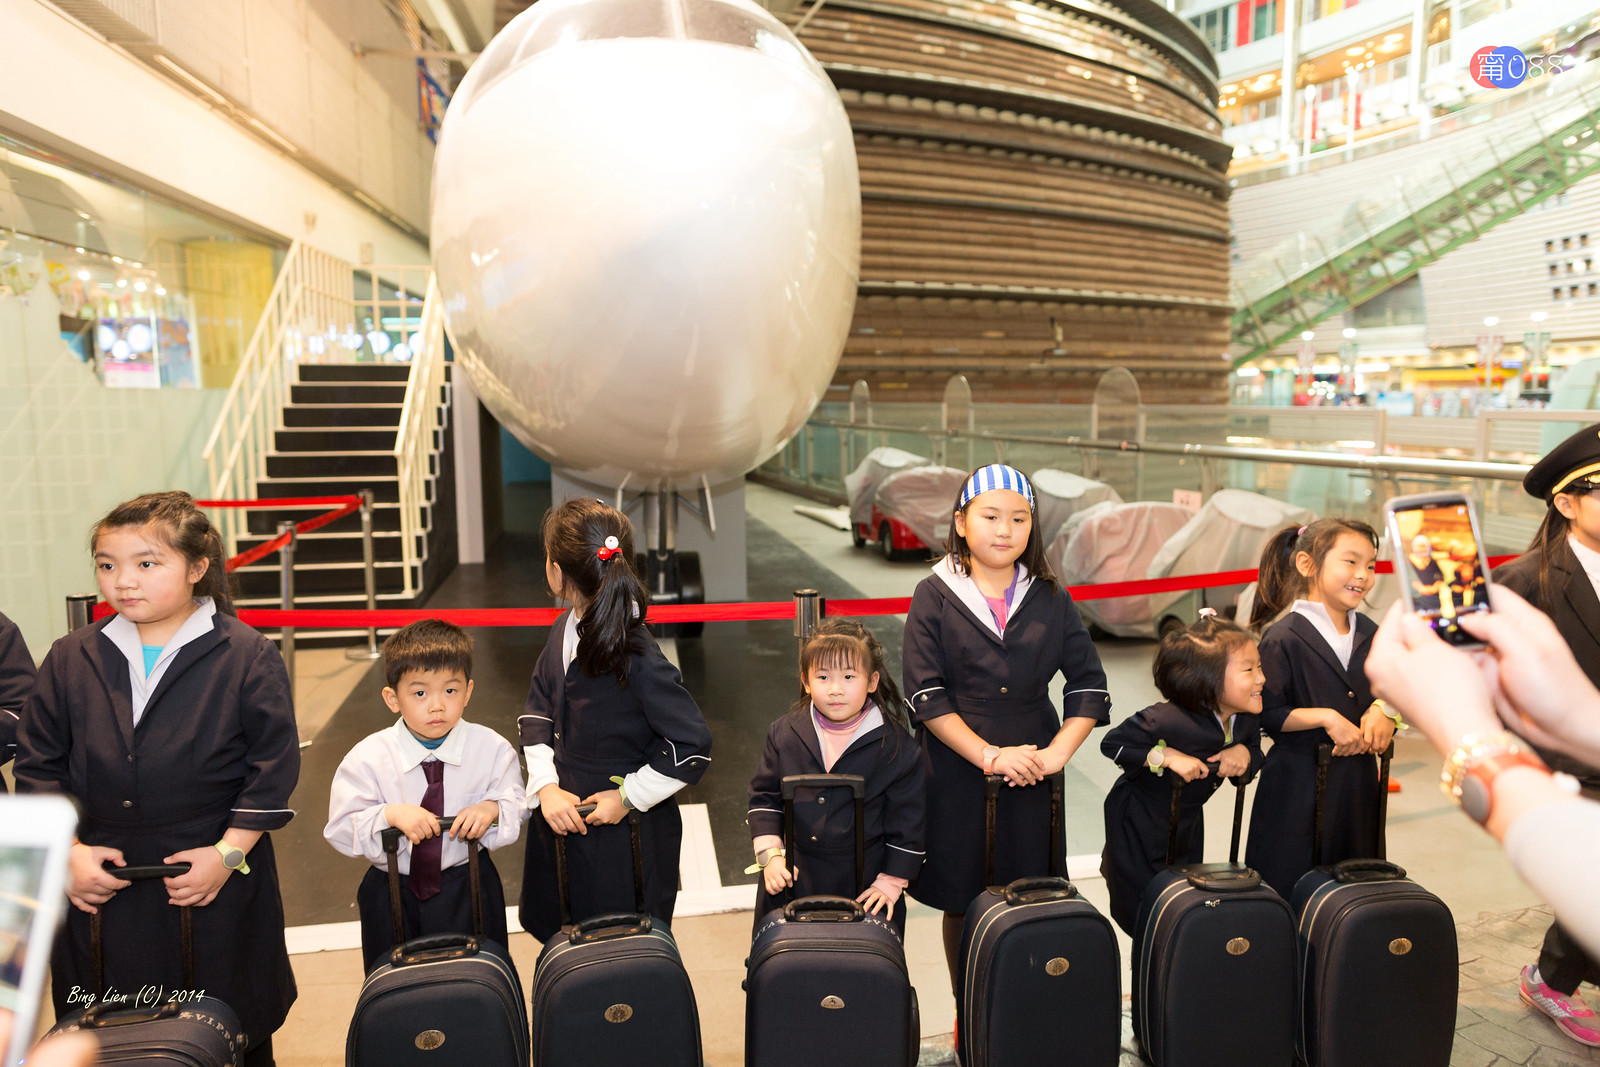 BabyBoss City (2) 航空公司當空姐